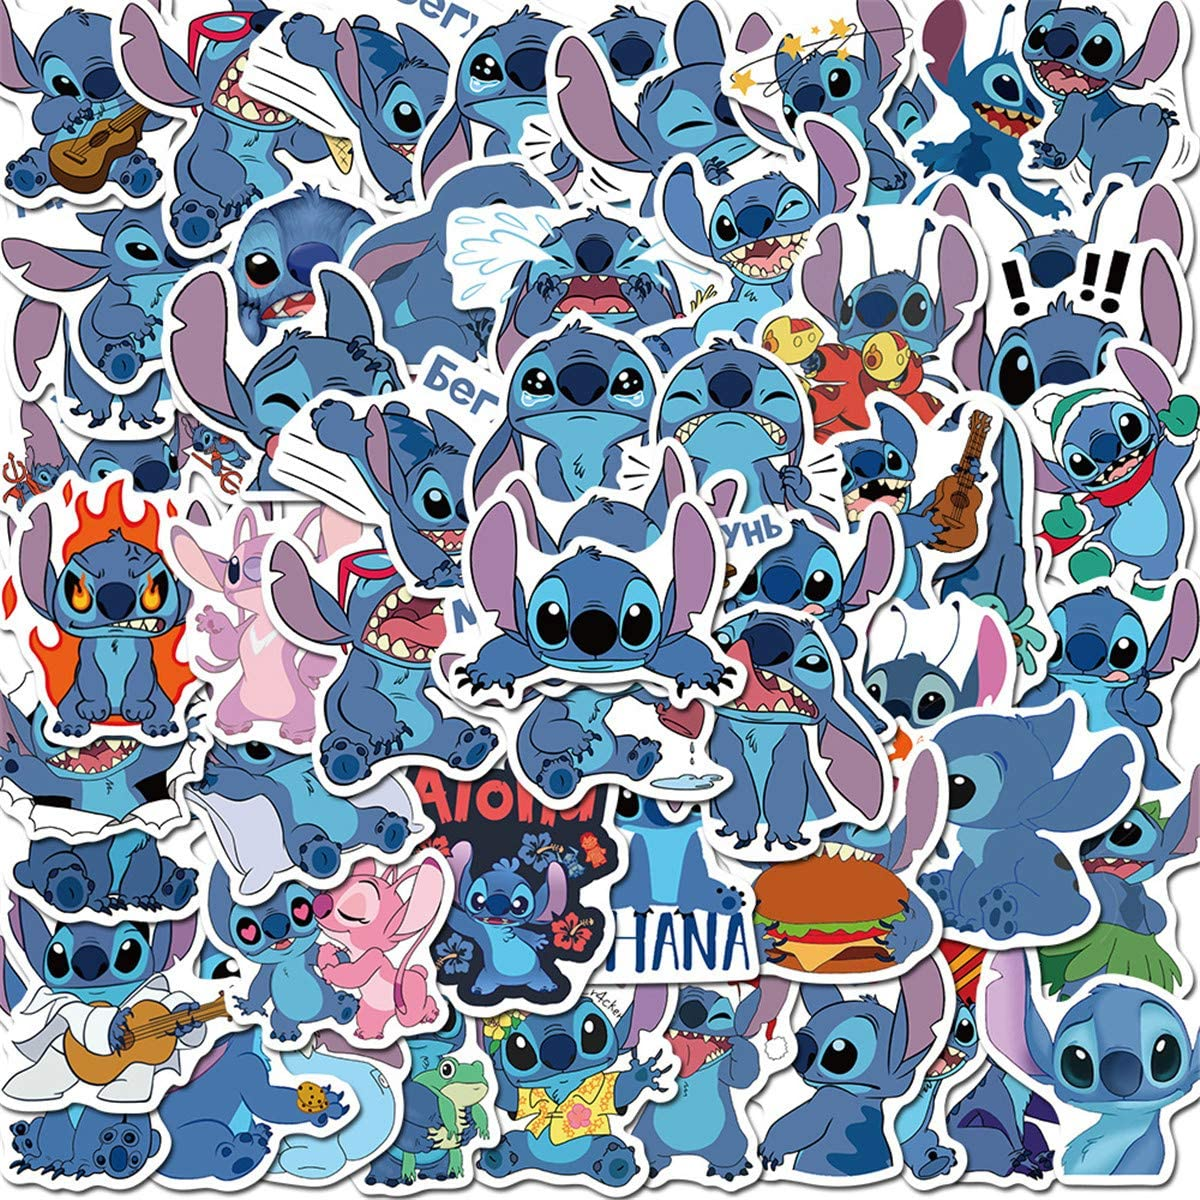 50Pcs Lilo & Stitch Stickers Waterproof Vinyl Stickers for Water Bottle Luggage Bike Car Decals (Stitch)